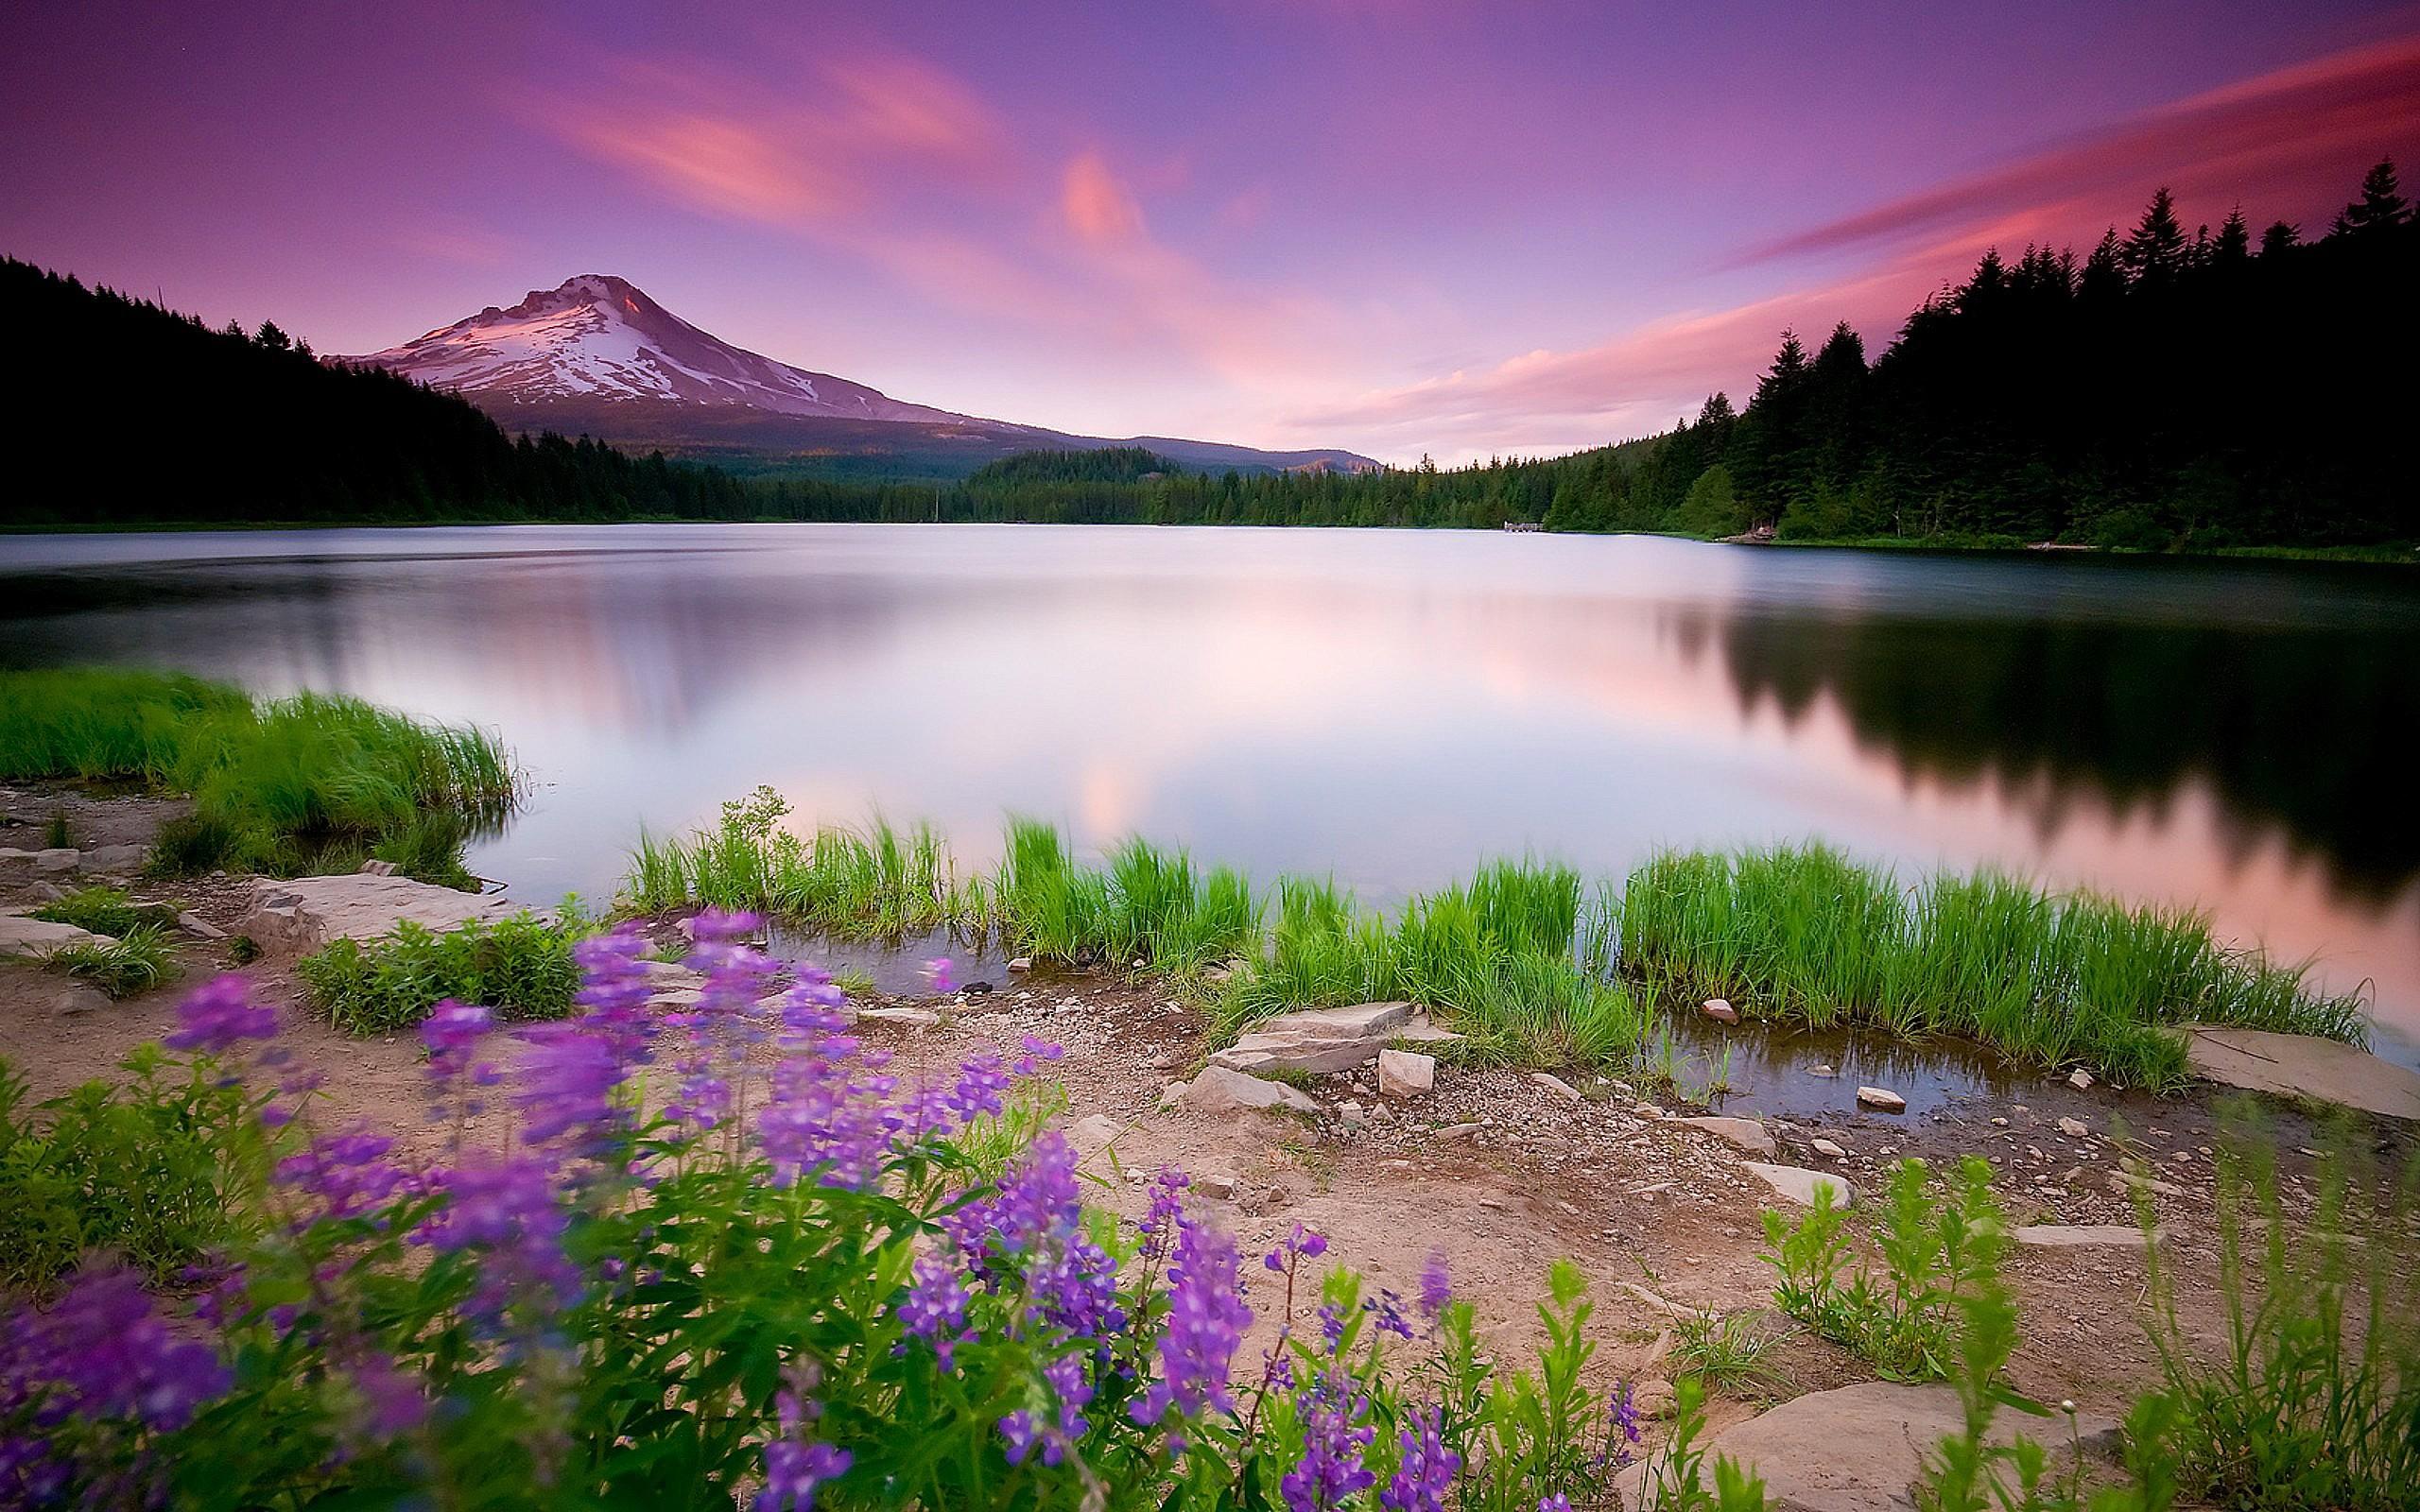 Un lago púrpura - 2560x1600